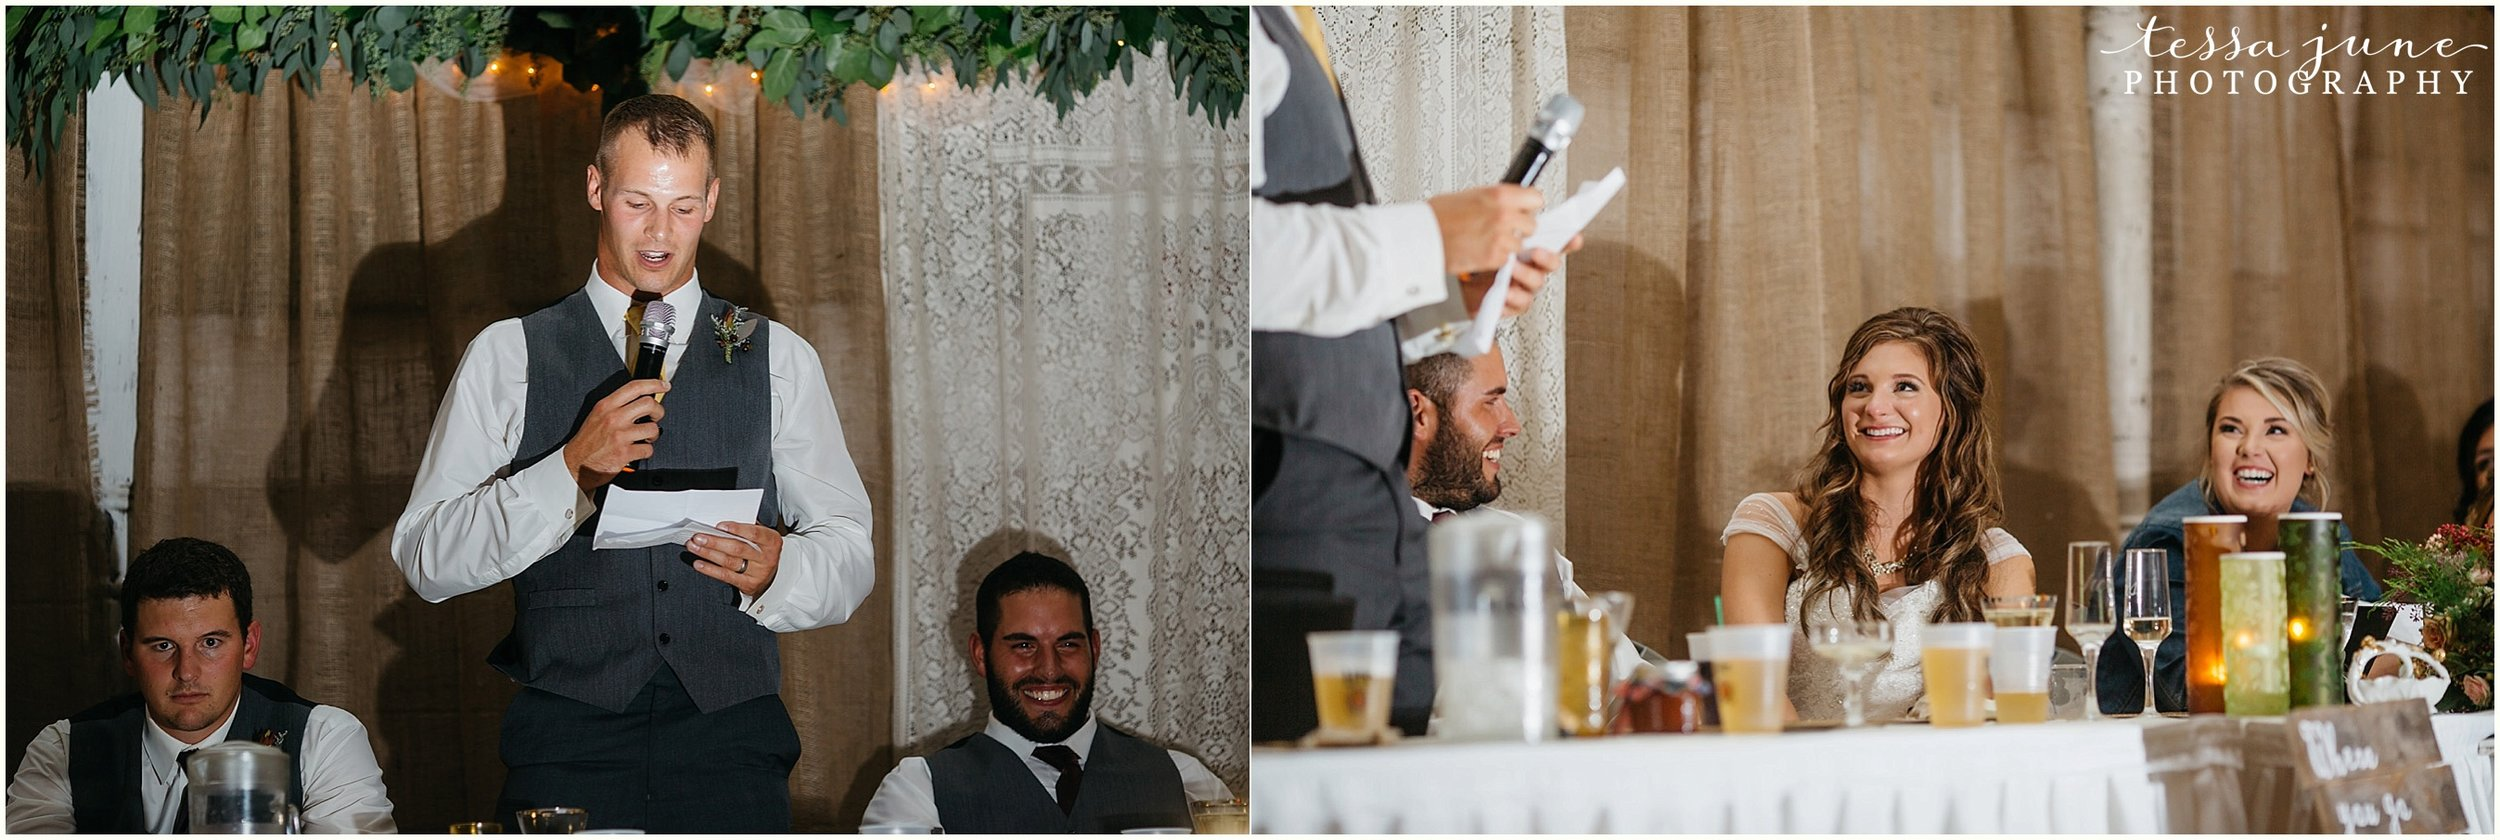 bohemian-minnesota-wedding-mismatched-bridesmaid-dresses-waterfall-st-cloud-tessa-june-photography-172.jpg